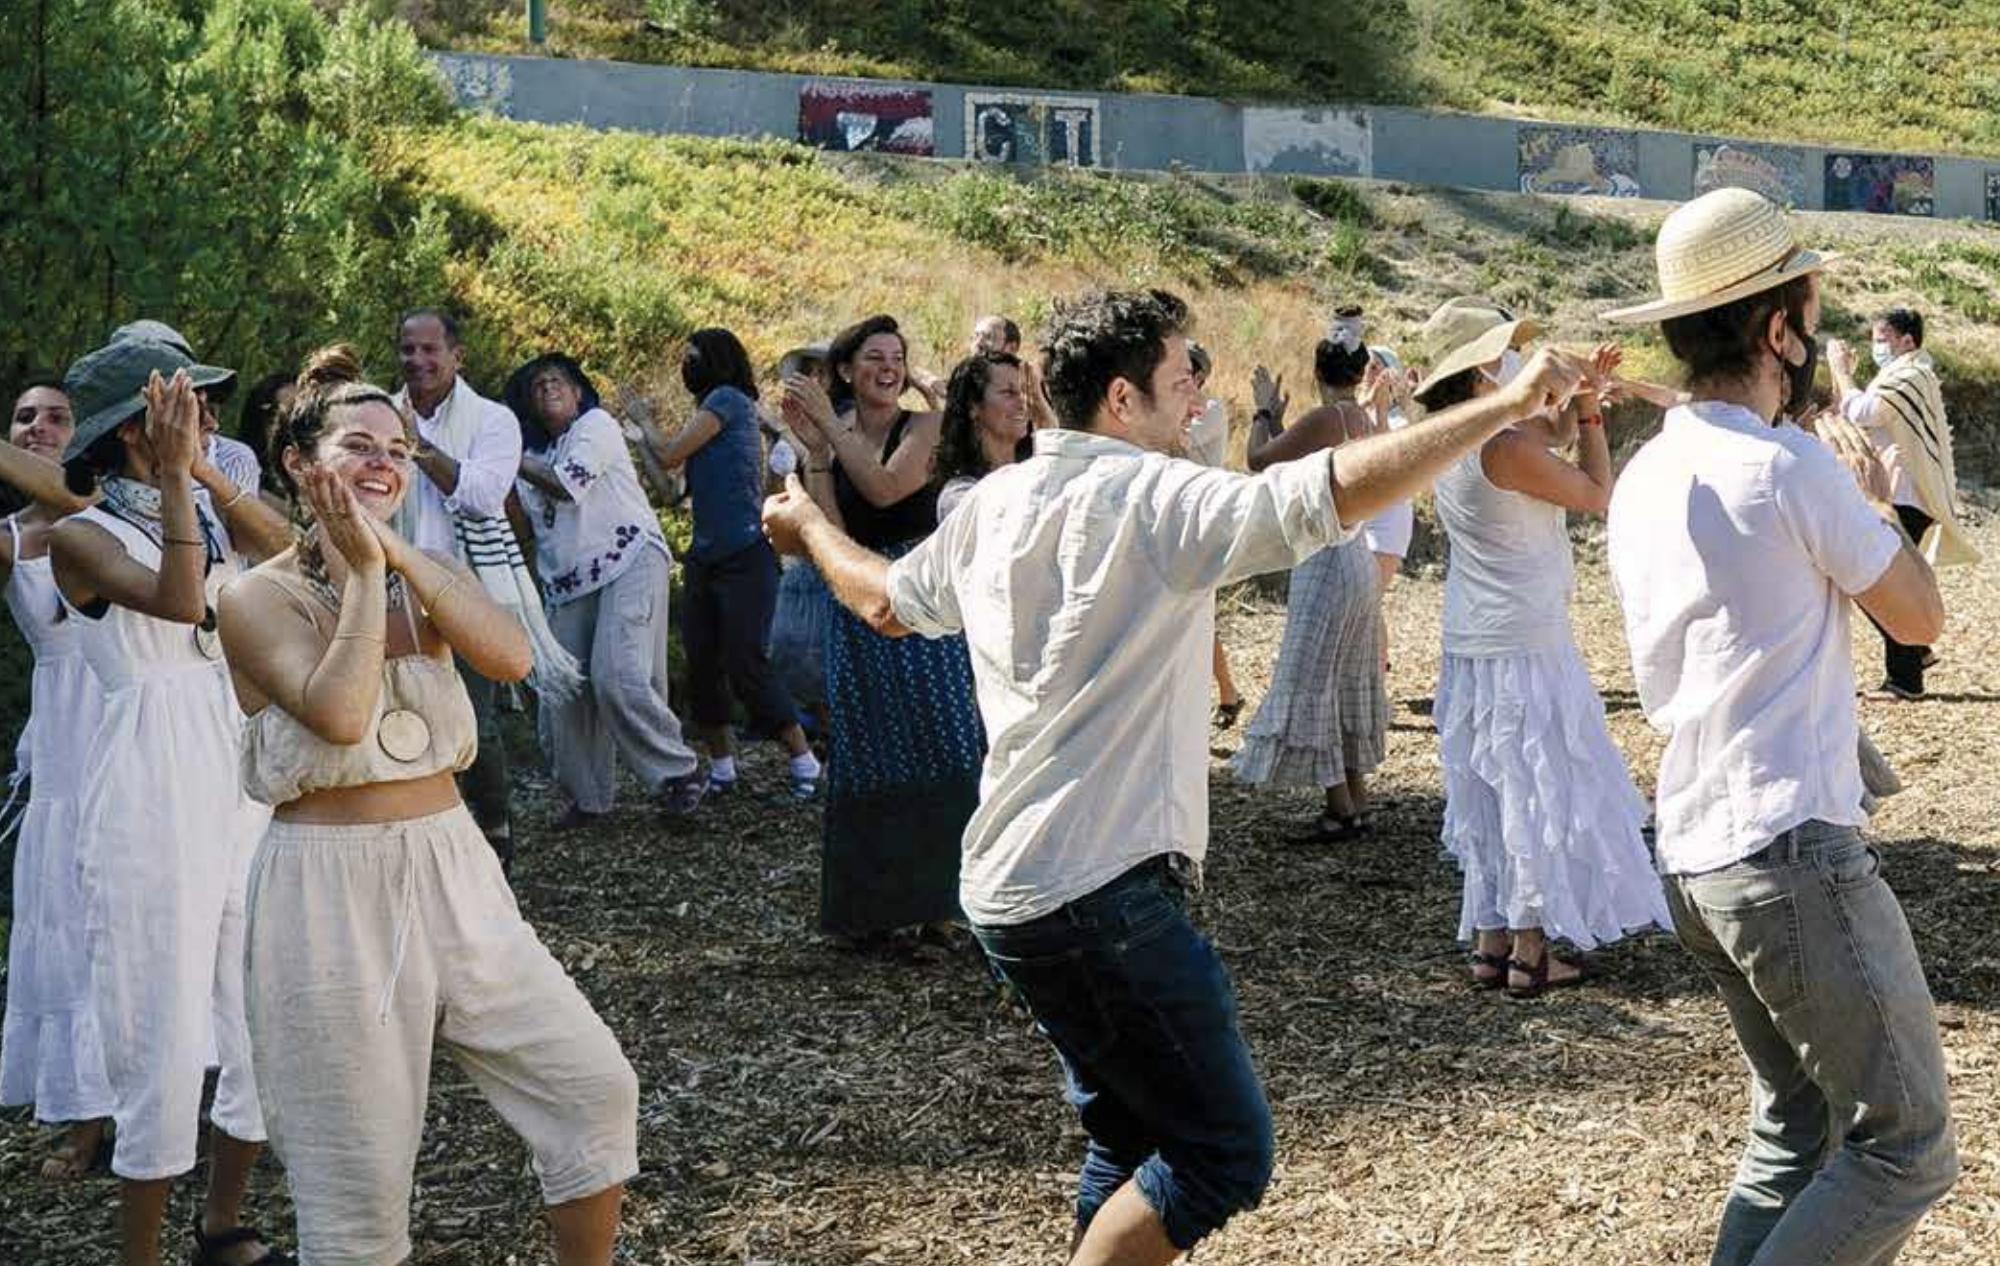 Wilderness Torah Rosh Hashanah celebration at Camp Newman, September 2021. (Photo/Darren Miller)